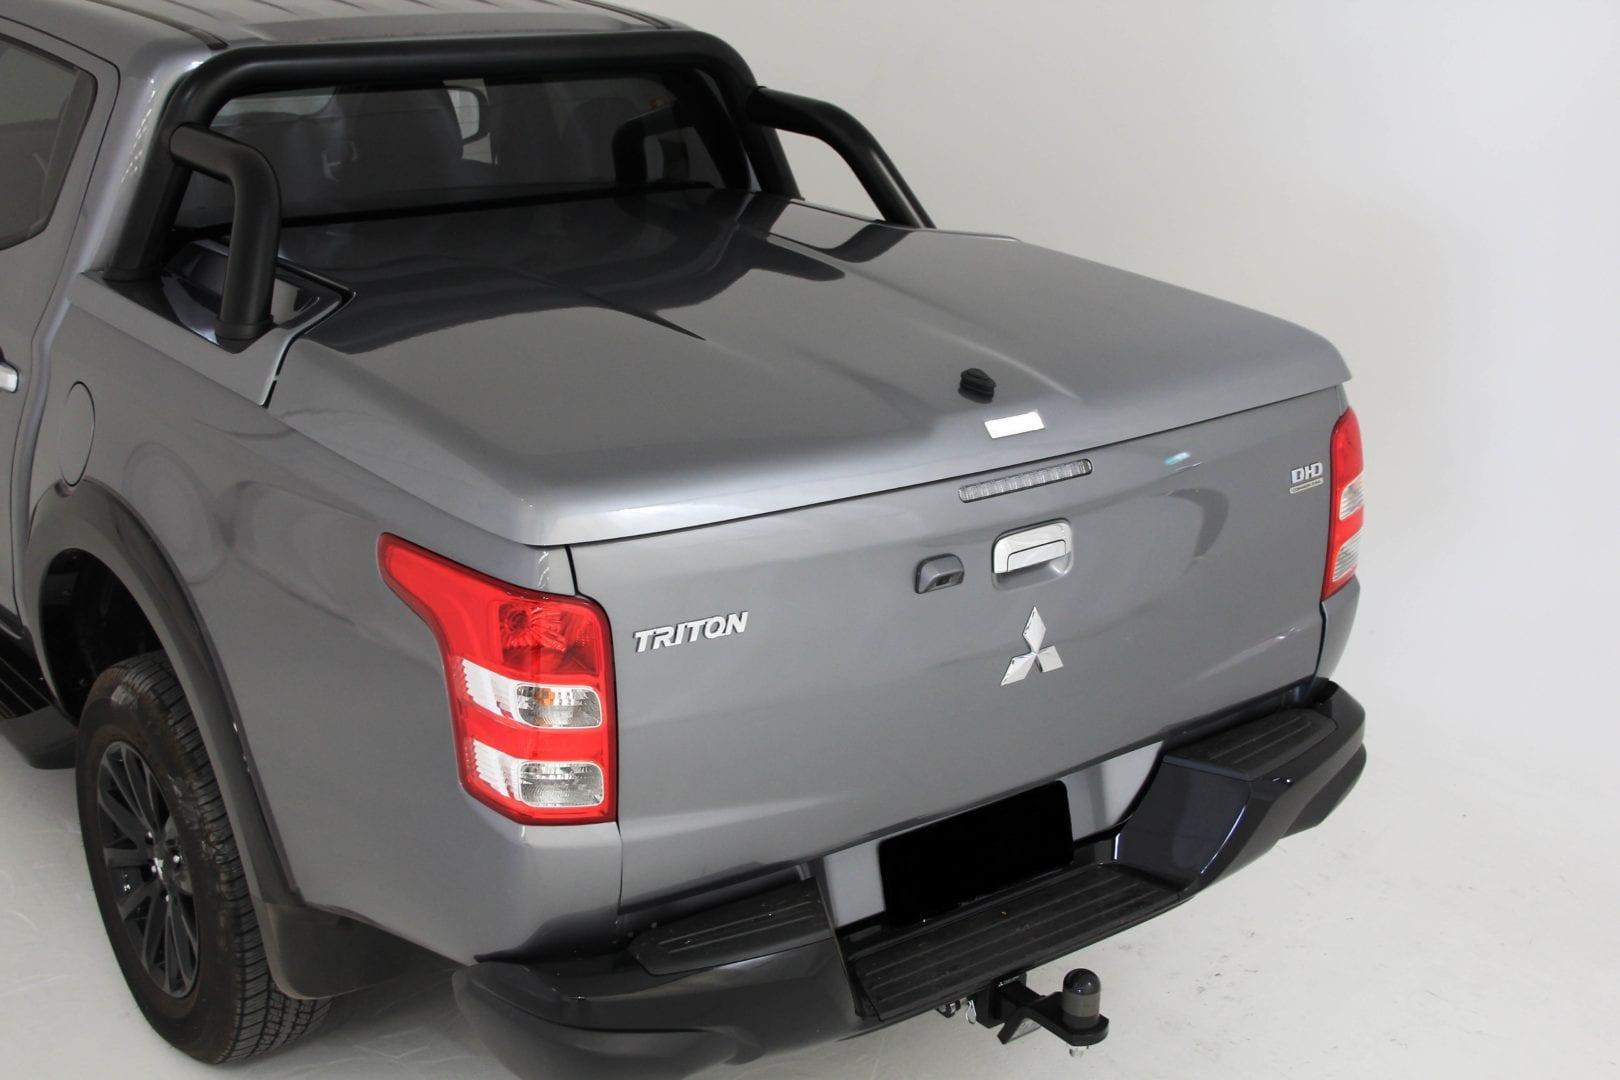 Mitsubishi Triton Hard Lid Mq Ute Options Dual Cab Jhp